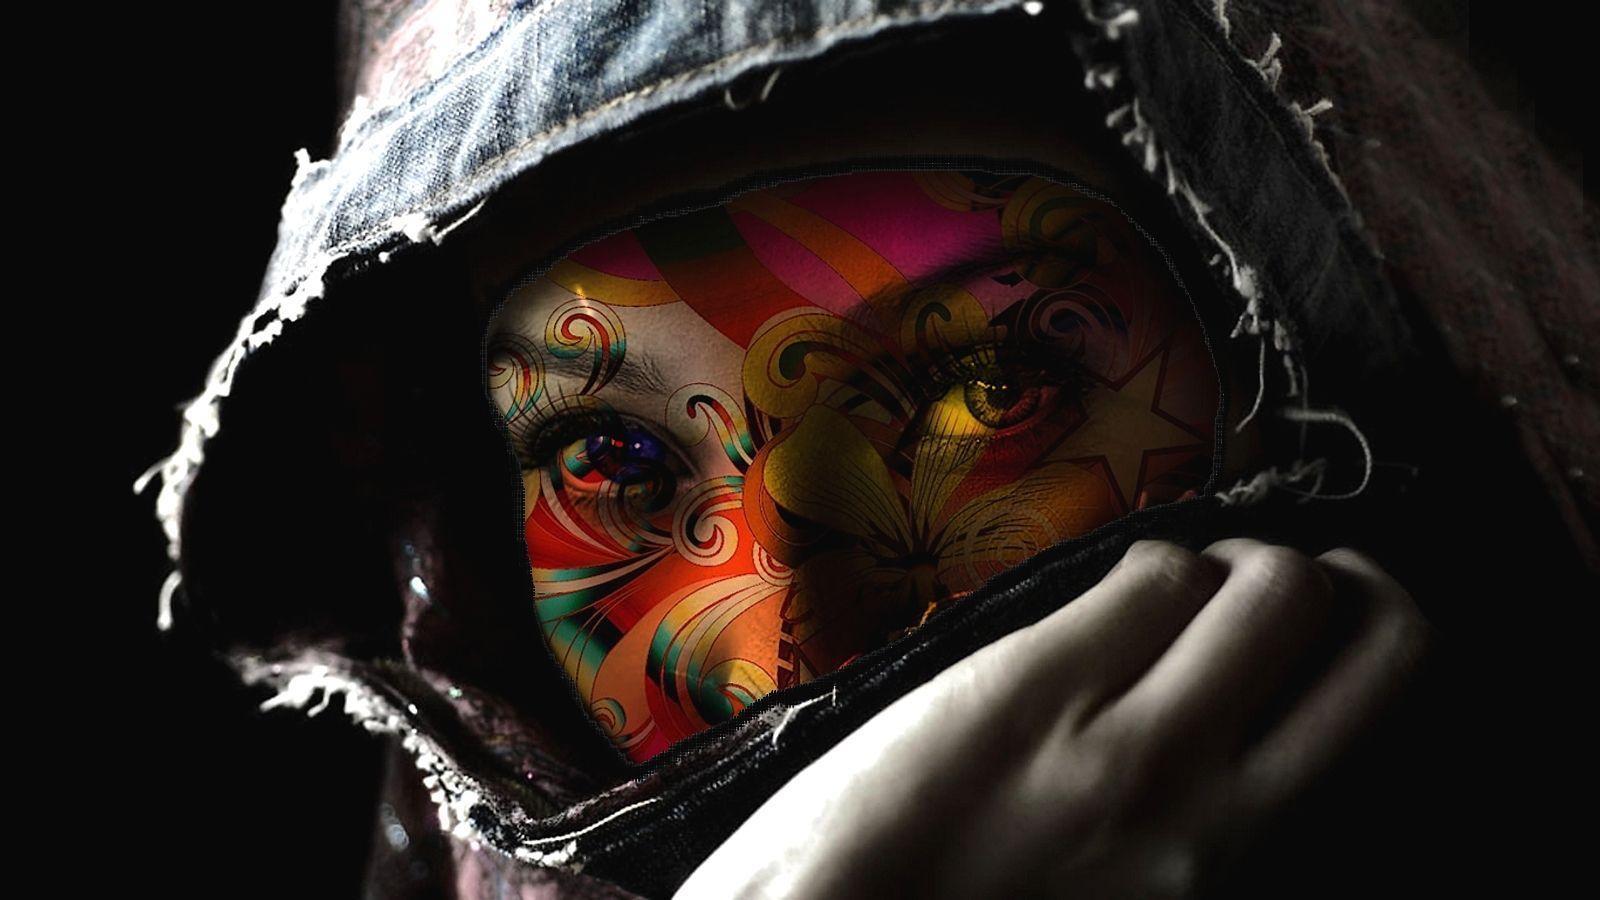 Tattoo Art Wallpapers - Wallpaper Cave